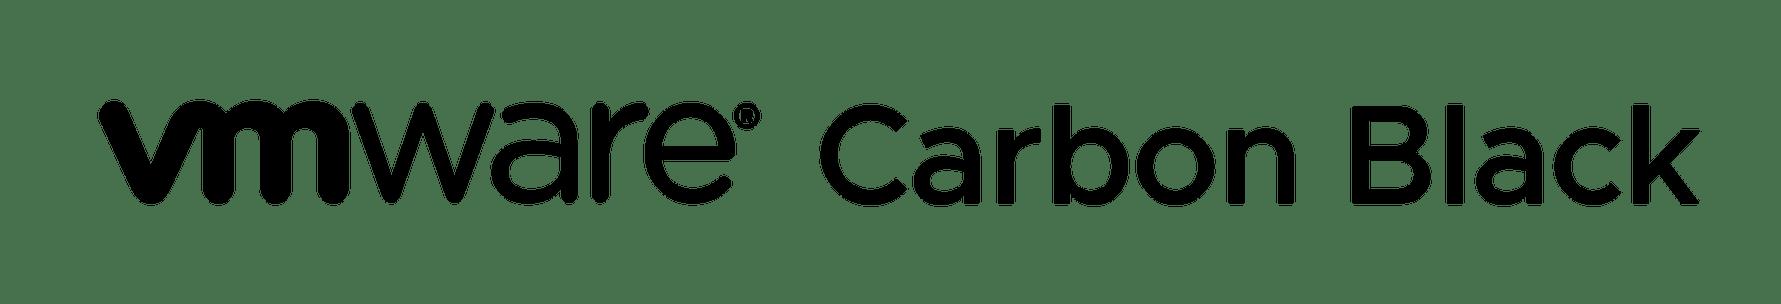 vm ware- carbon black